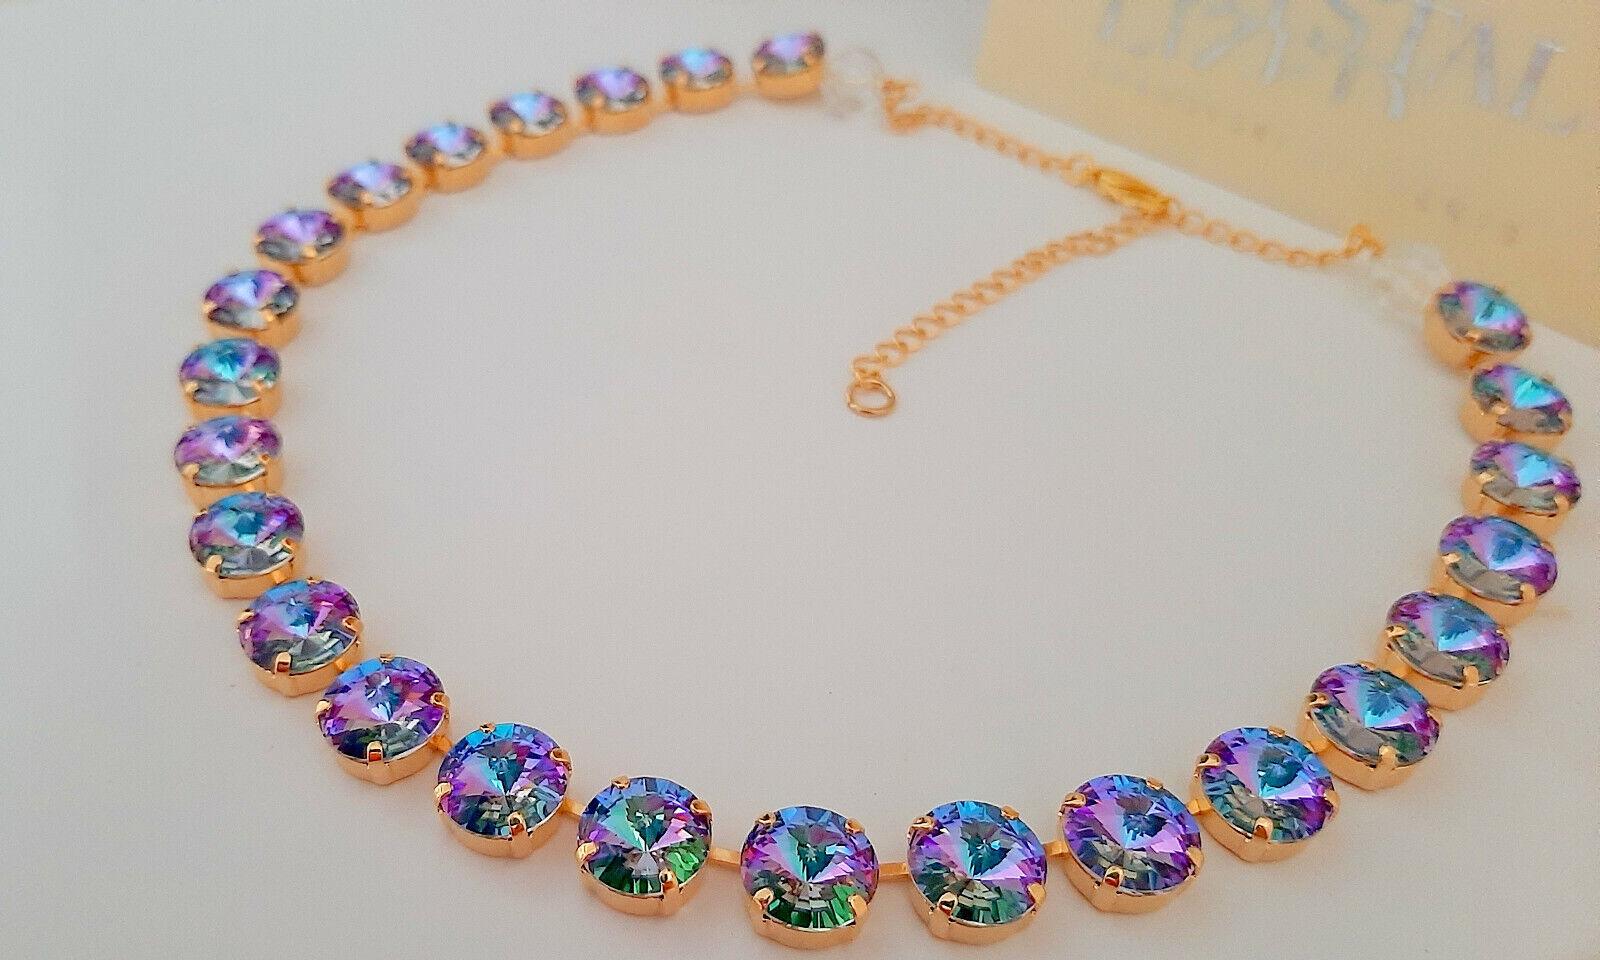 Light Vitrail Rivoli Necklace w/ Swarovski Crystals • Edwardian Tennis Choker